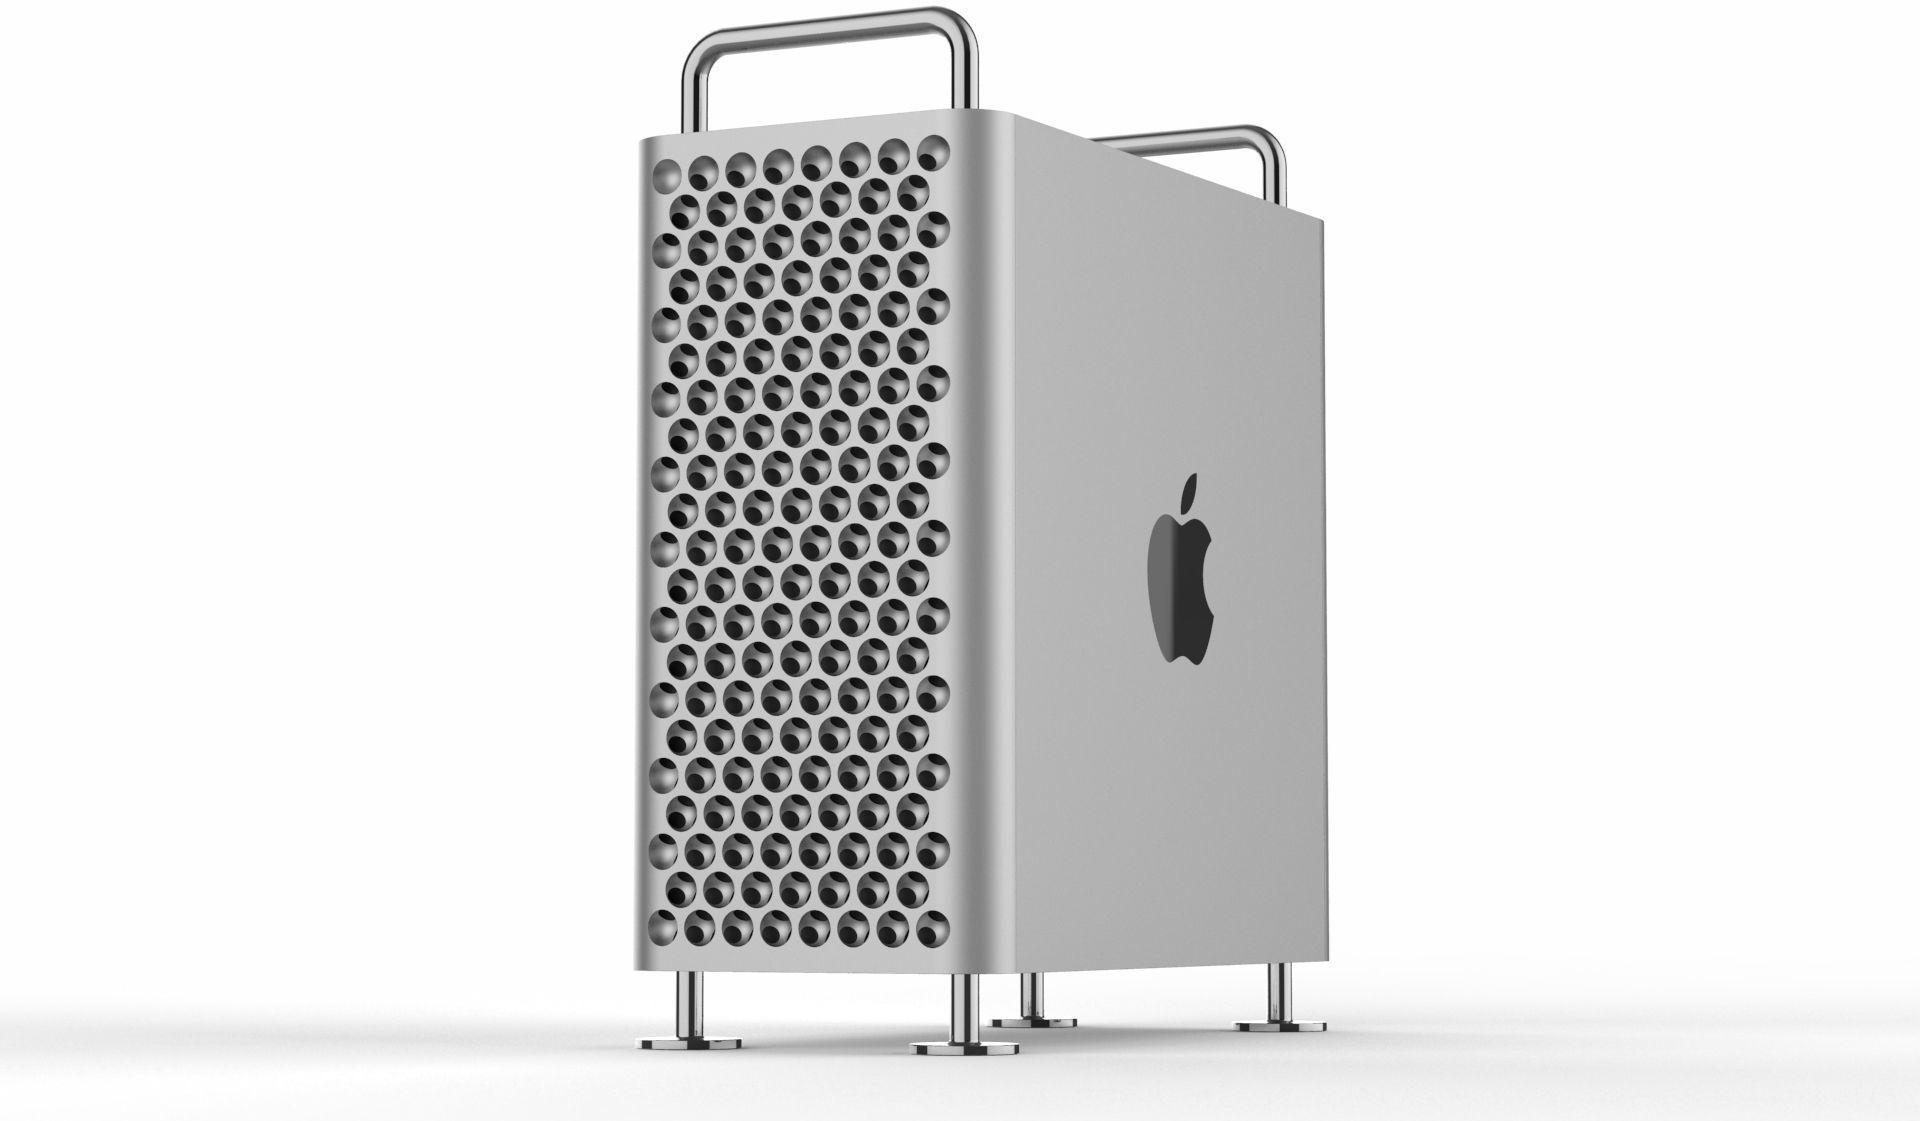 Modelo 3D do Mac Pro